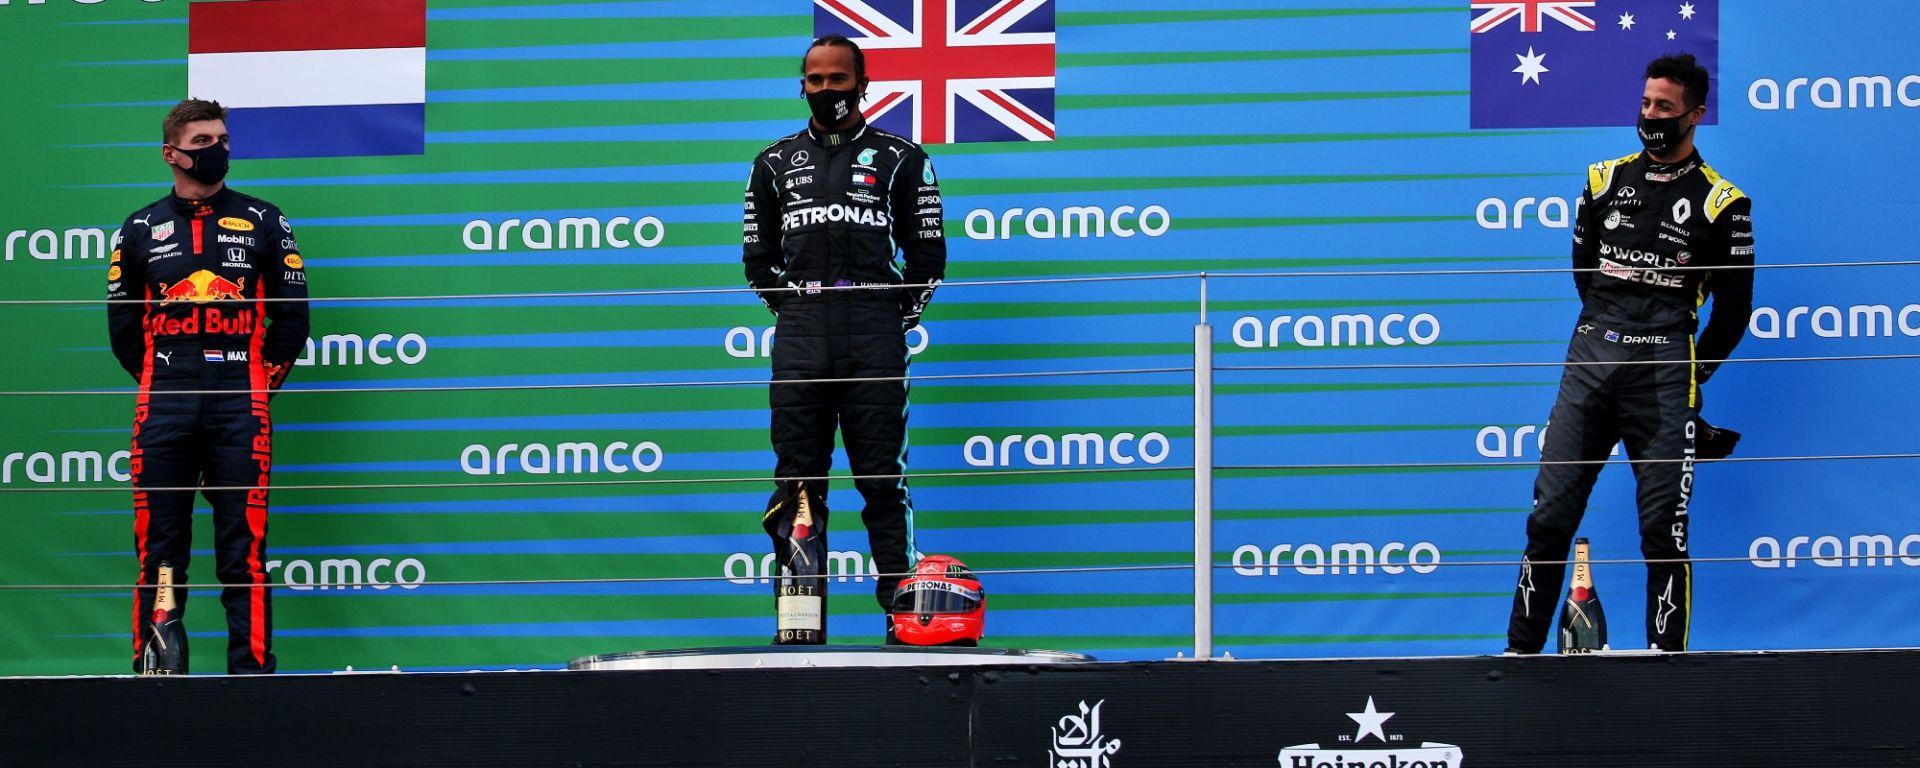 GP Eifel 2020, Nurburgring: il podio con Verstappen, Hamilton e Ricciardo